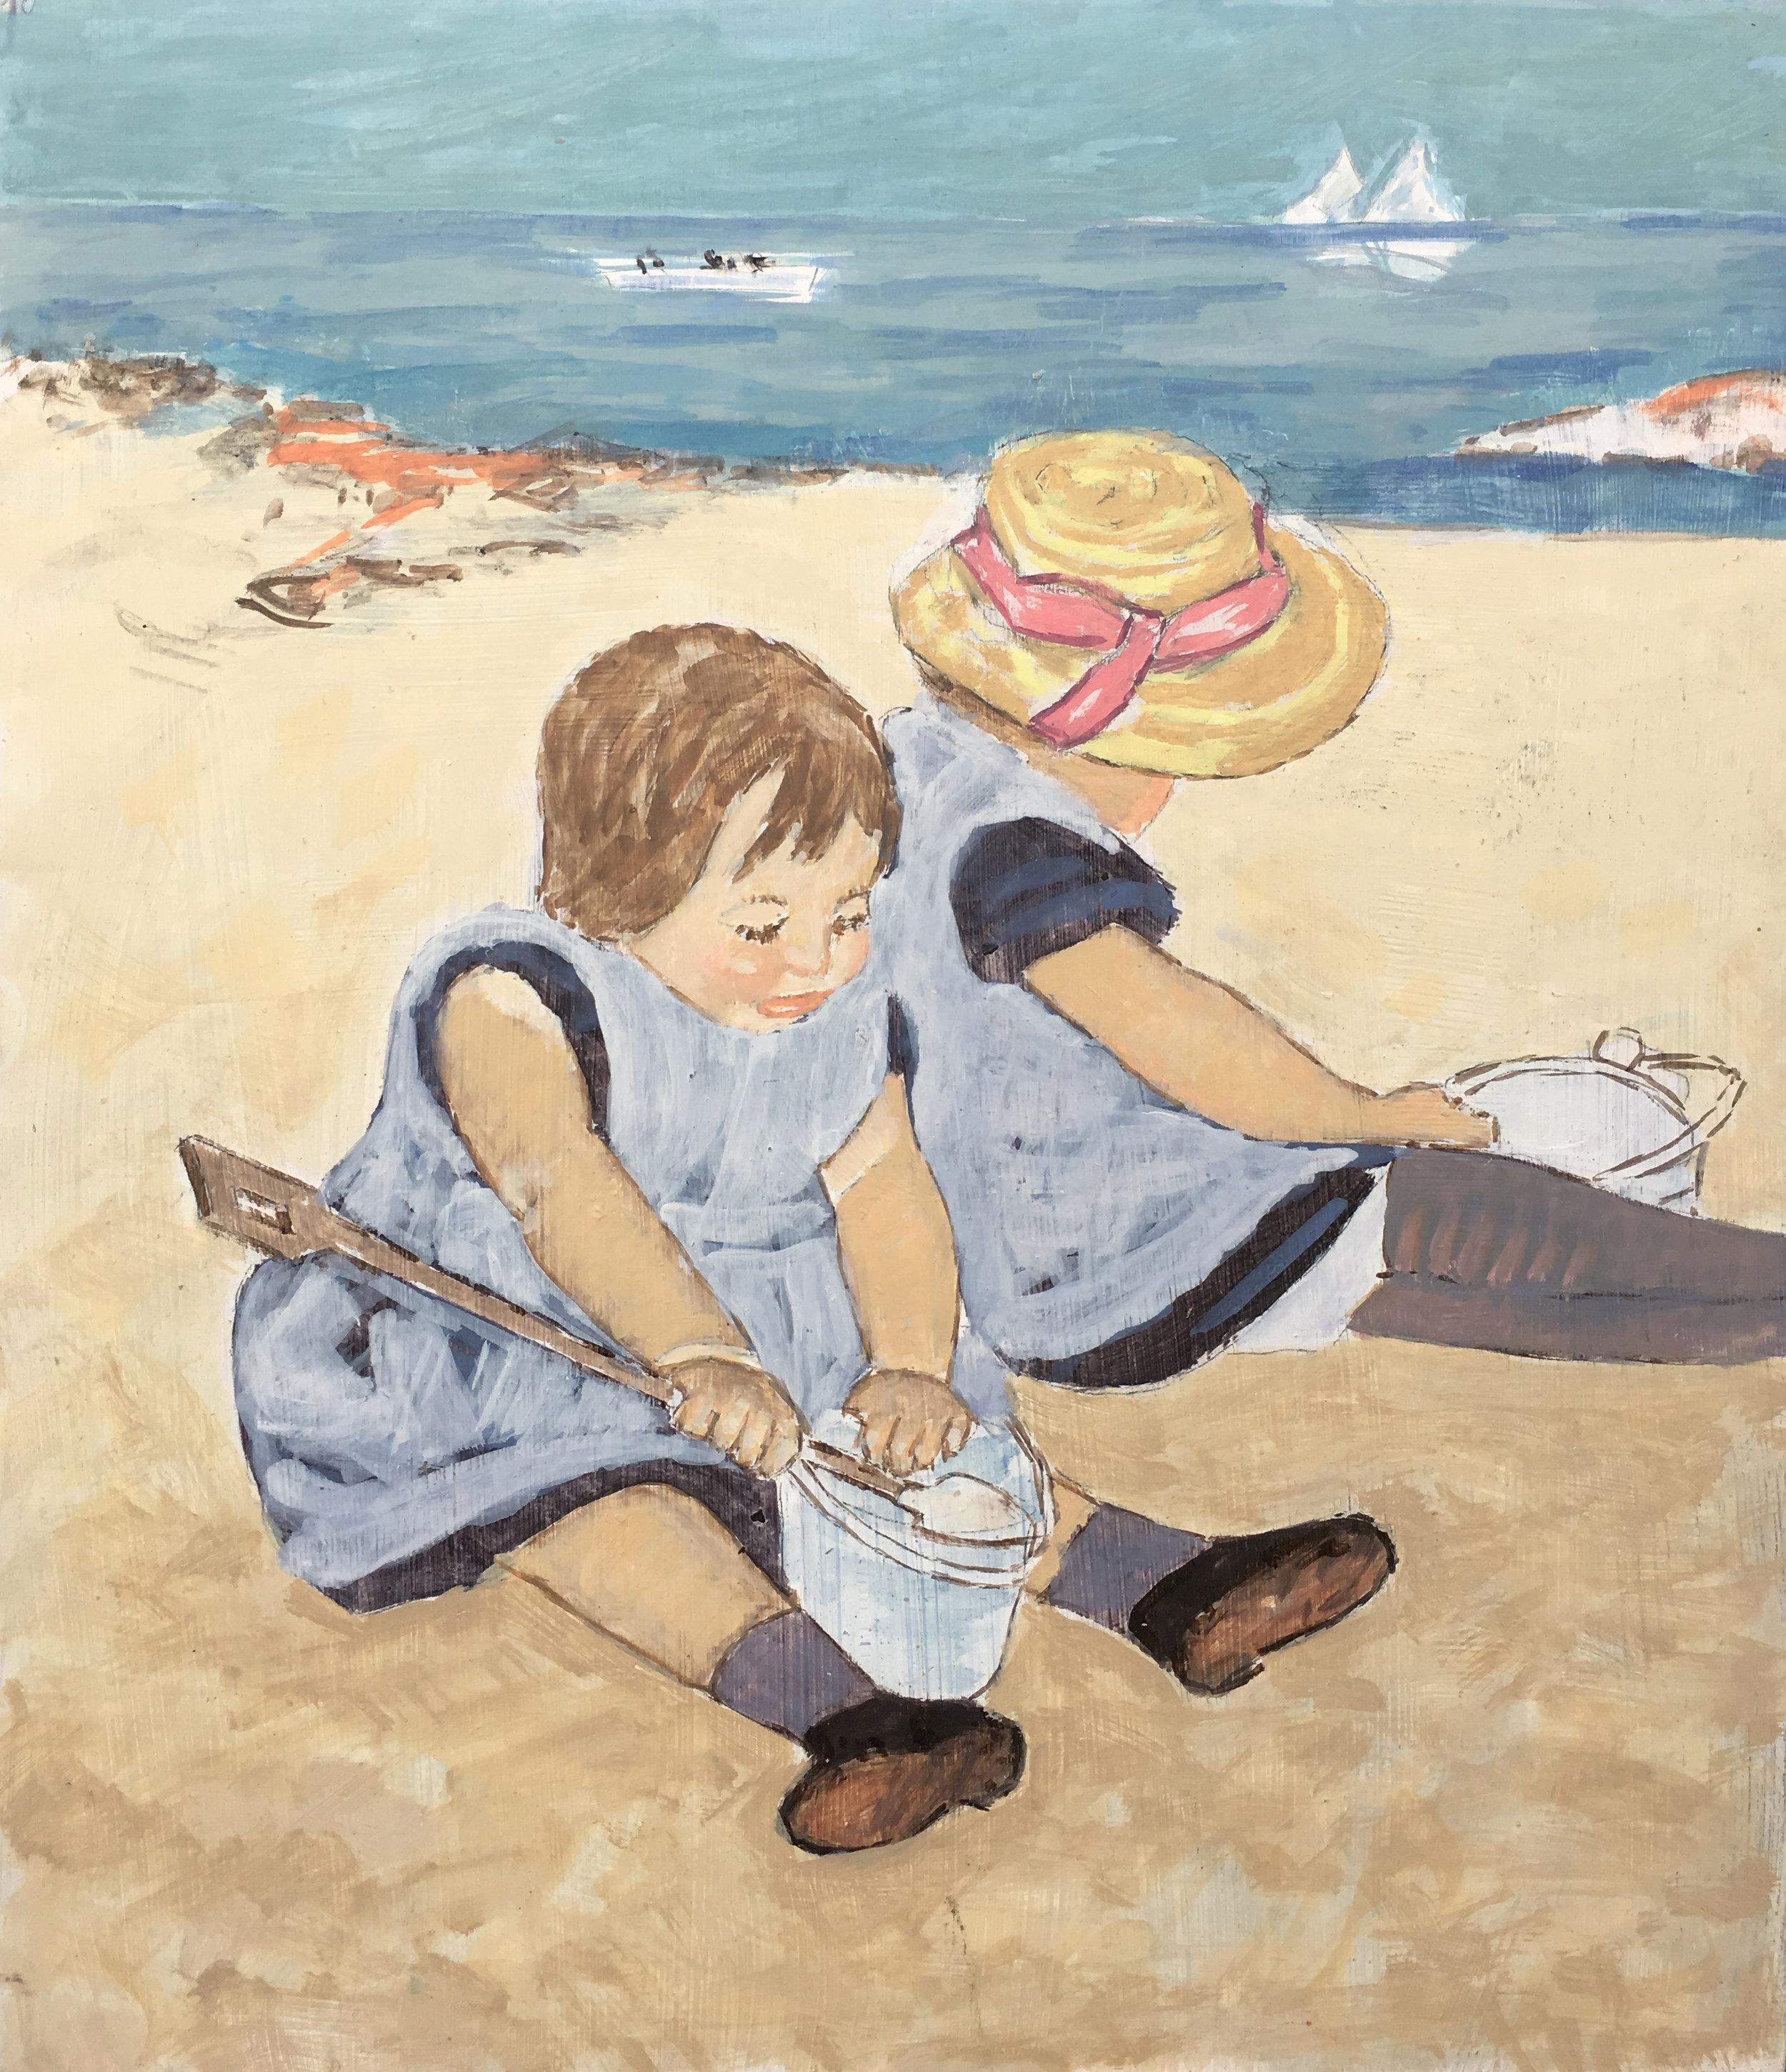 Bambine sulla sabbia